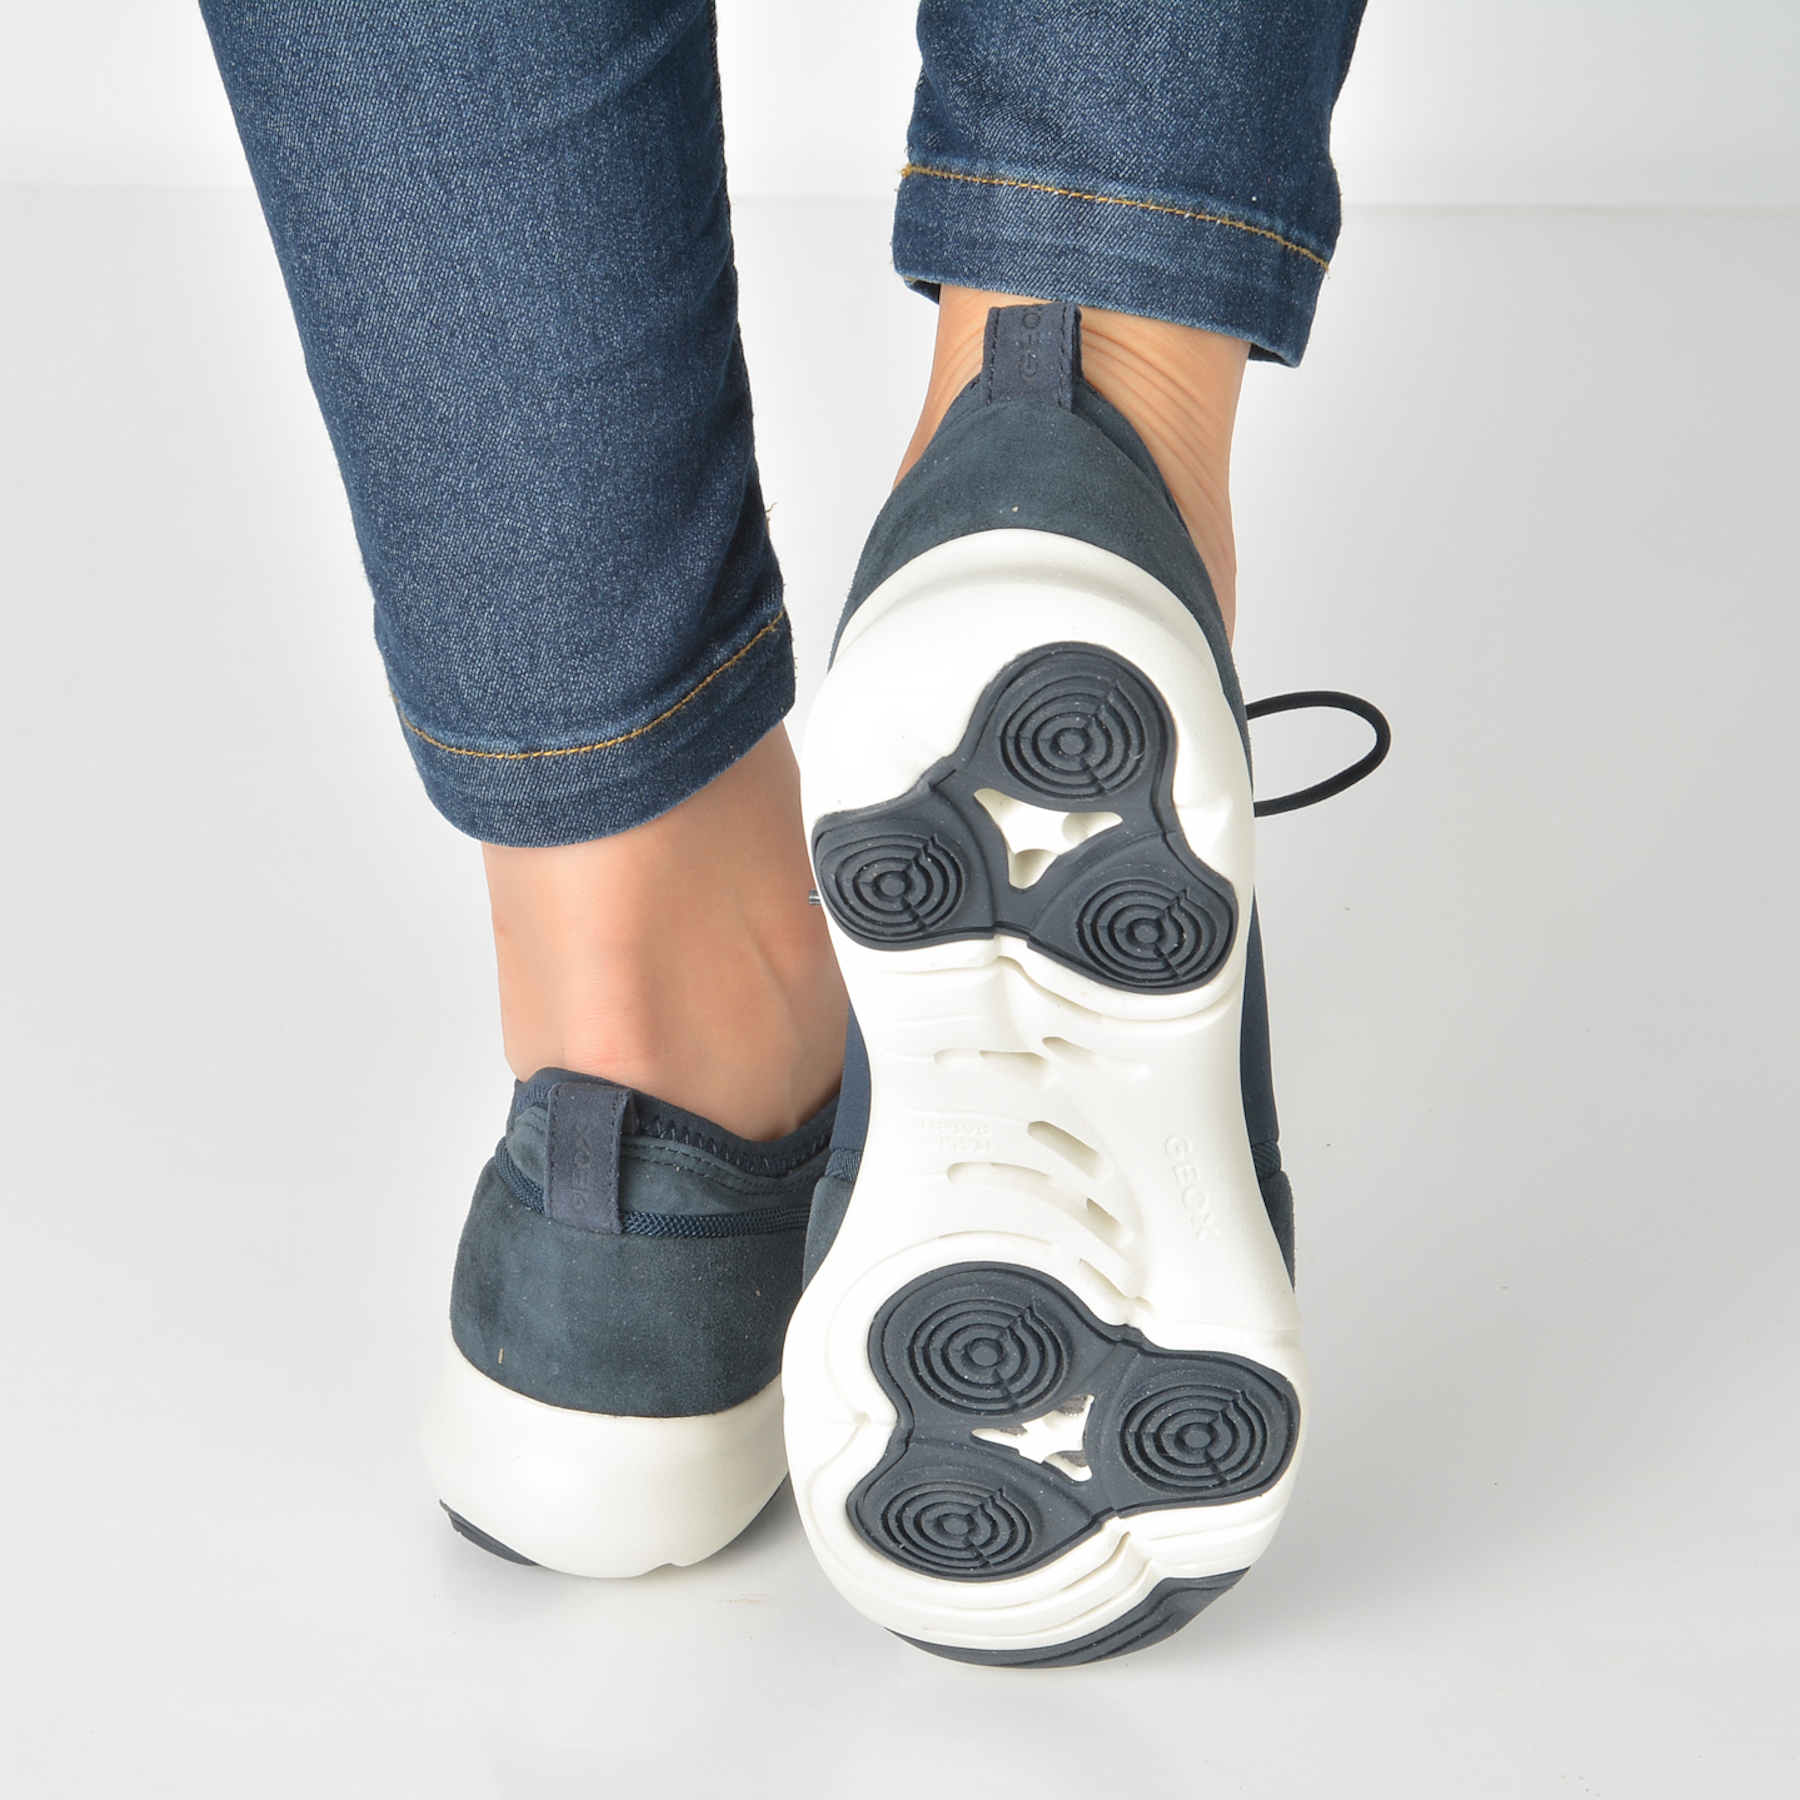 Pantofi Sport Geox Bleumarin, D829da, Din Piele Intoarsa